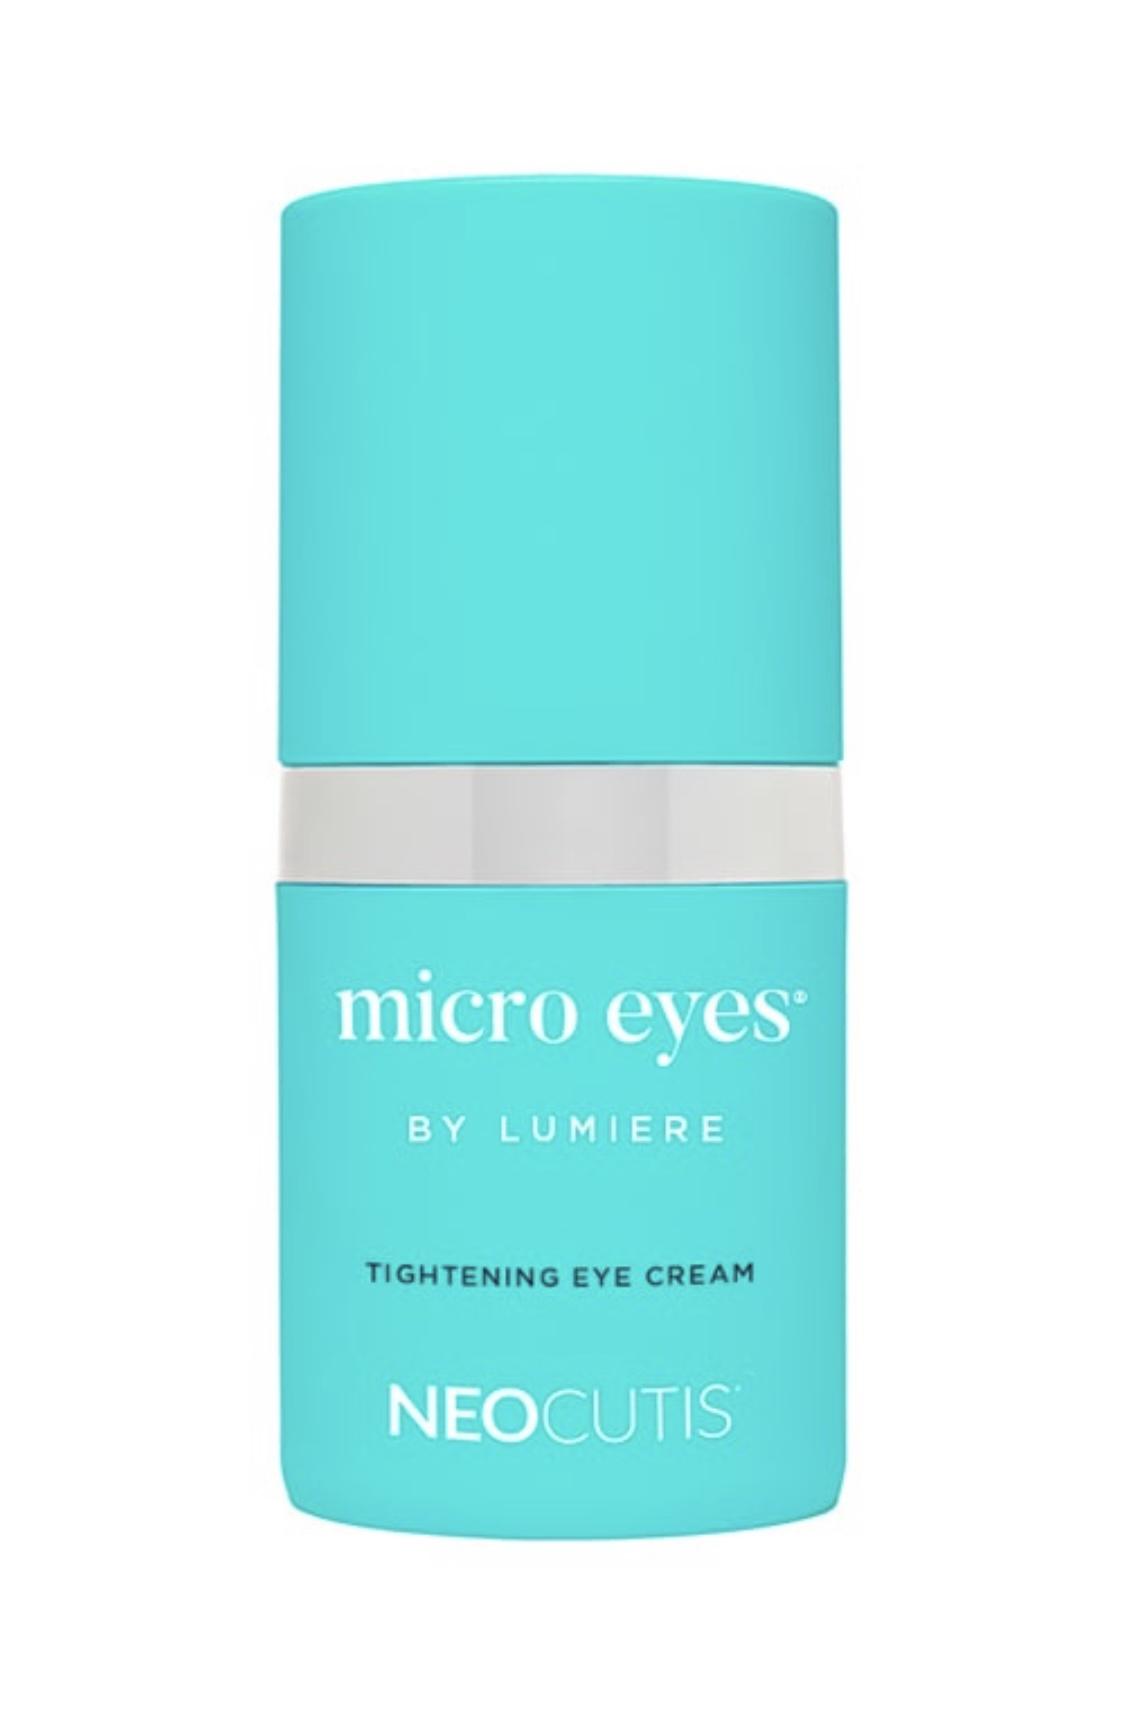 NeoCutis Micro Eyes By Lumiere - Tightening Cream